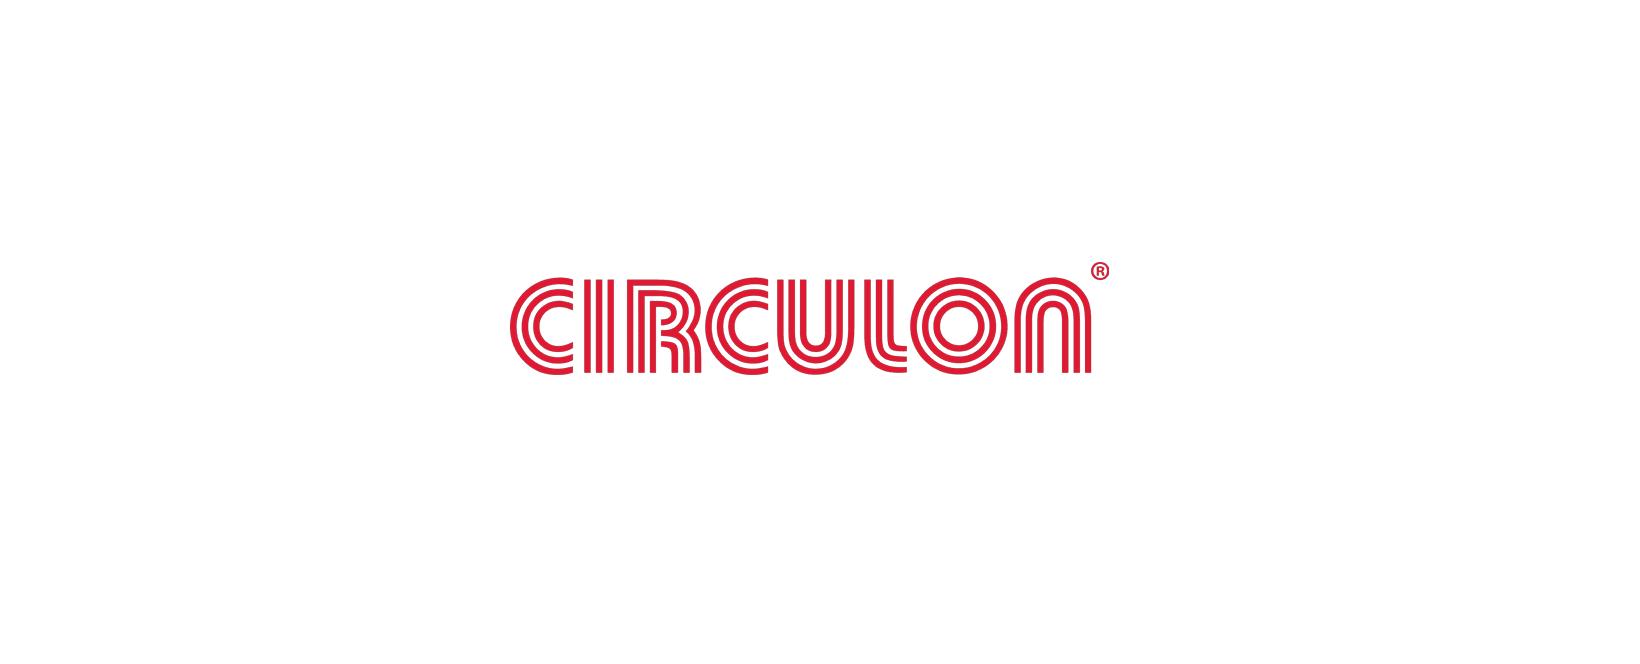 Circulon Coupon Code 2021